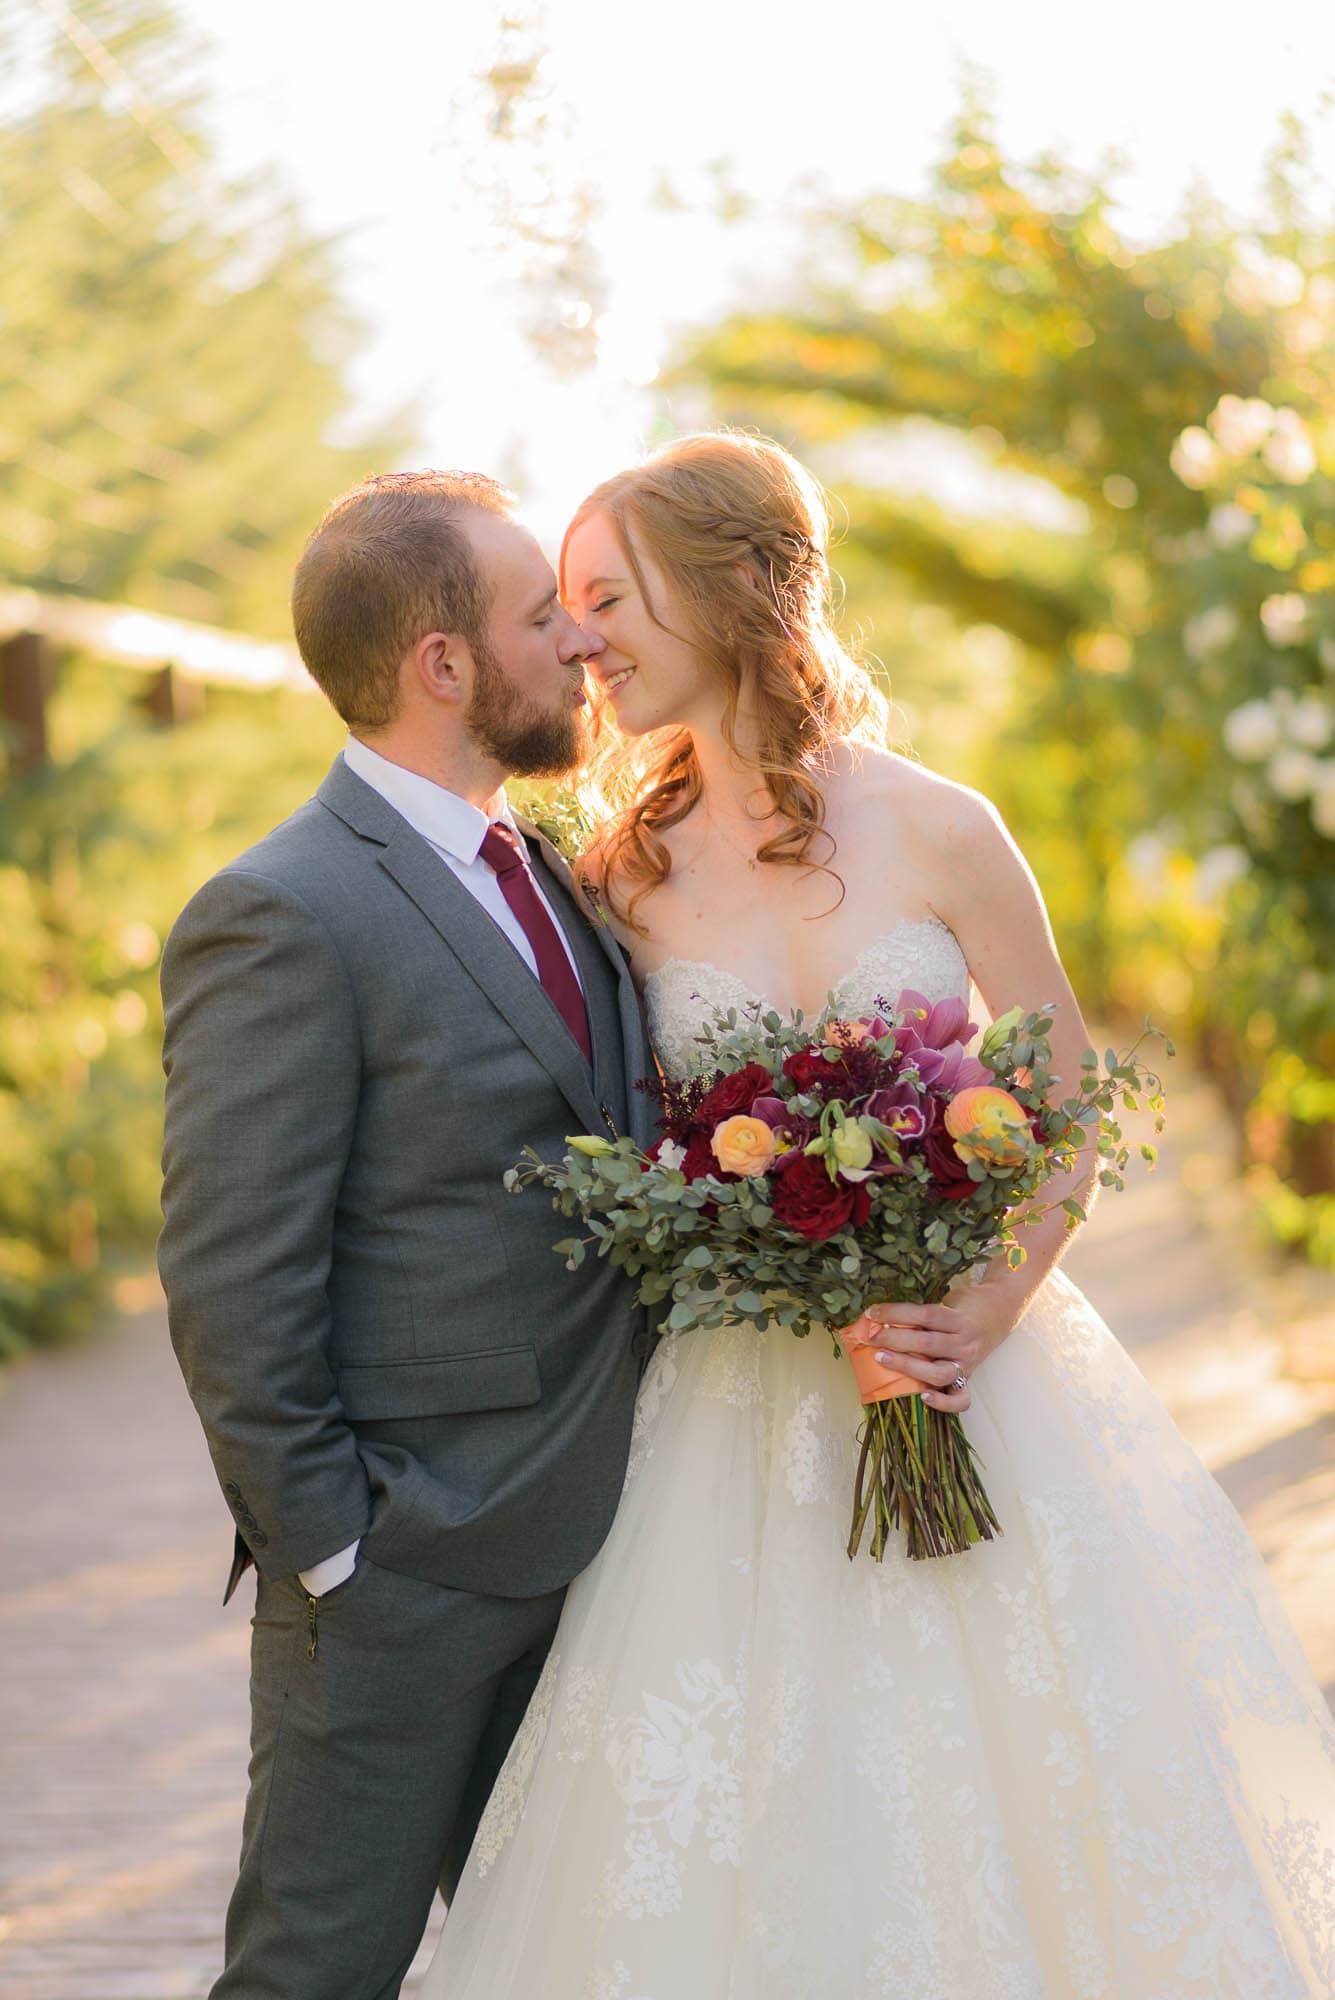 441_Alan_and_Heidi_Serendipity_Garden_Wedding_10-27-2018